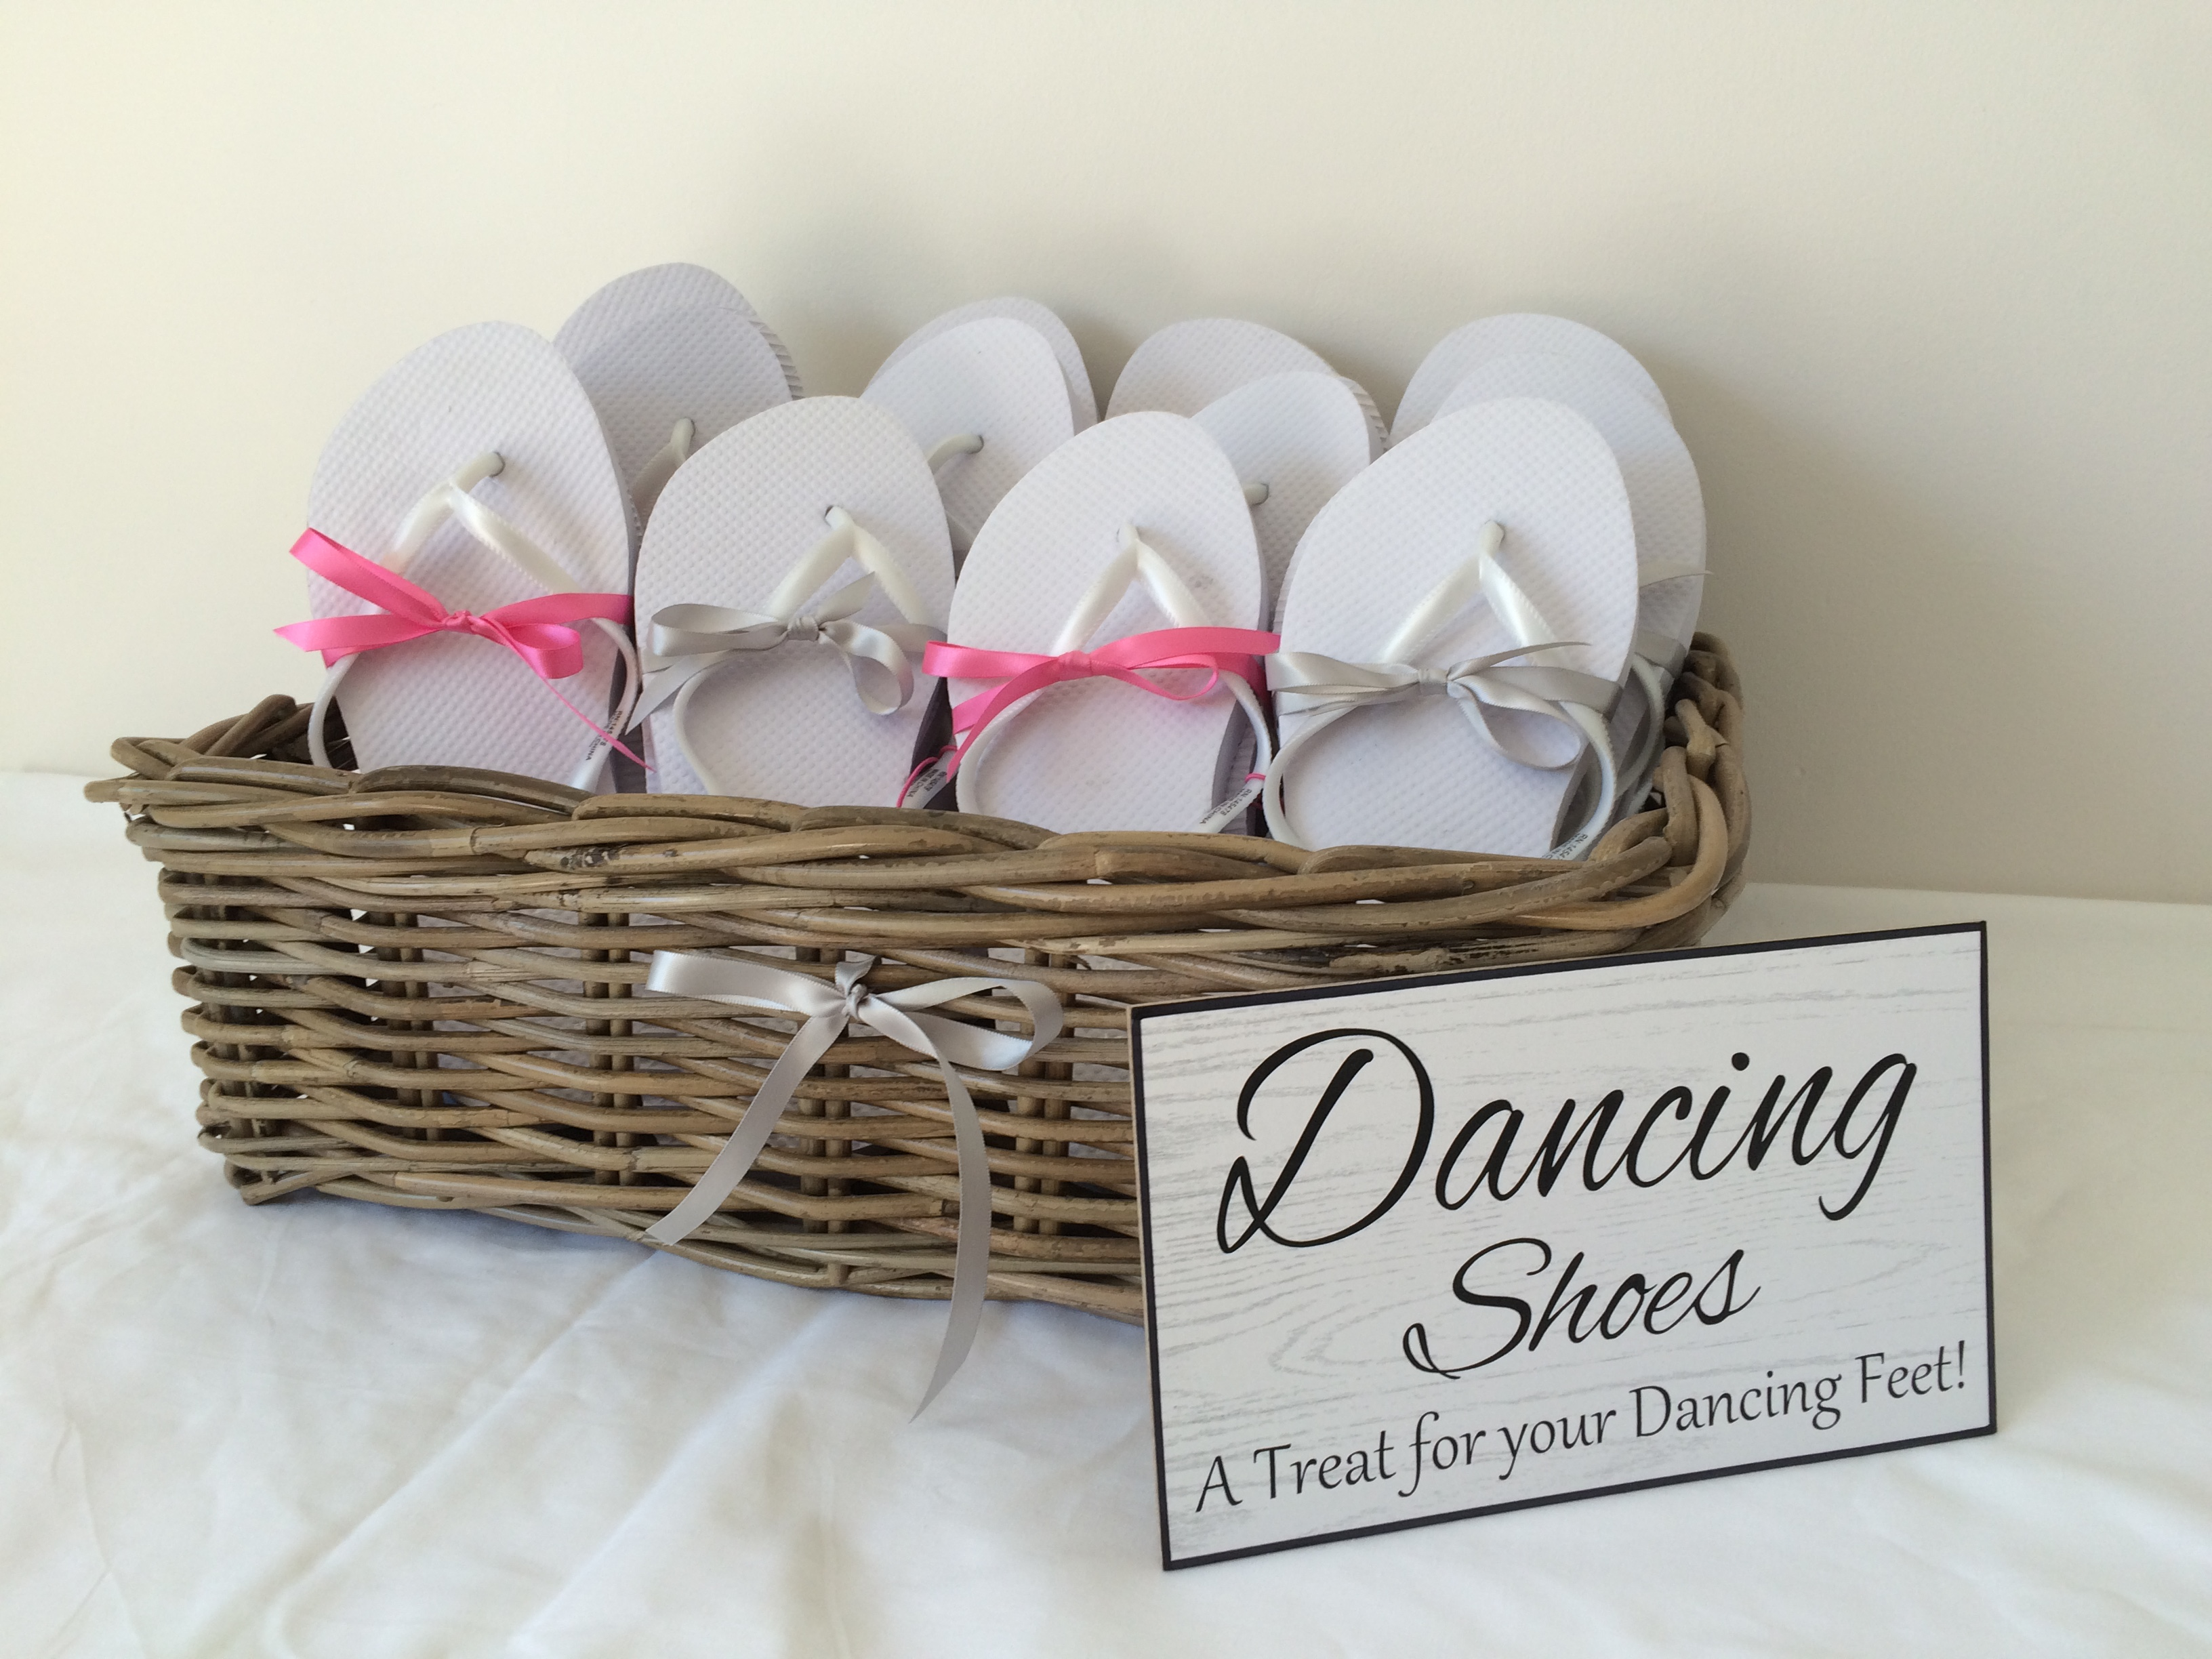 4fc94c72f Dancing Shoes - Flip Flops - Wedding Day Service - Wedding Decor UK